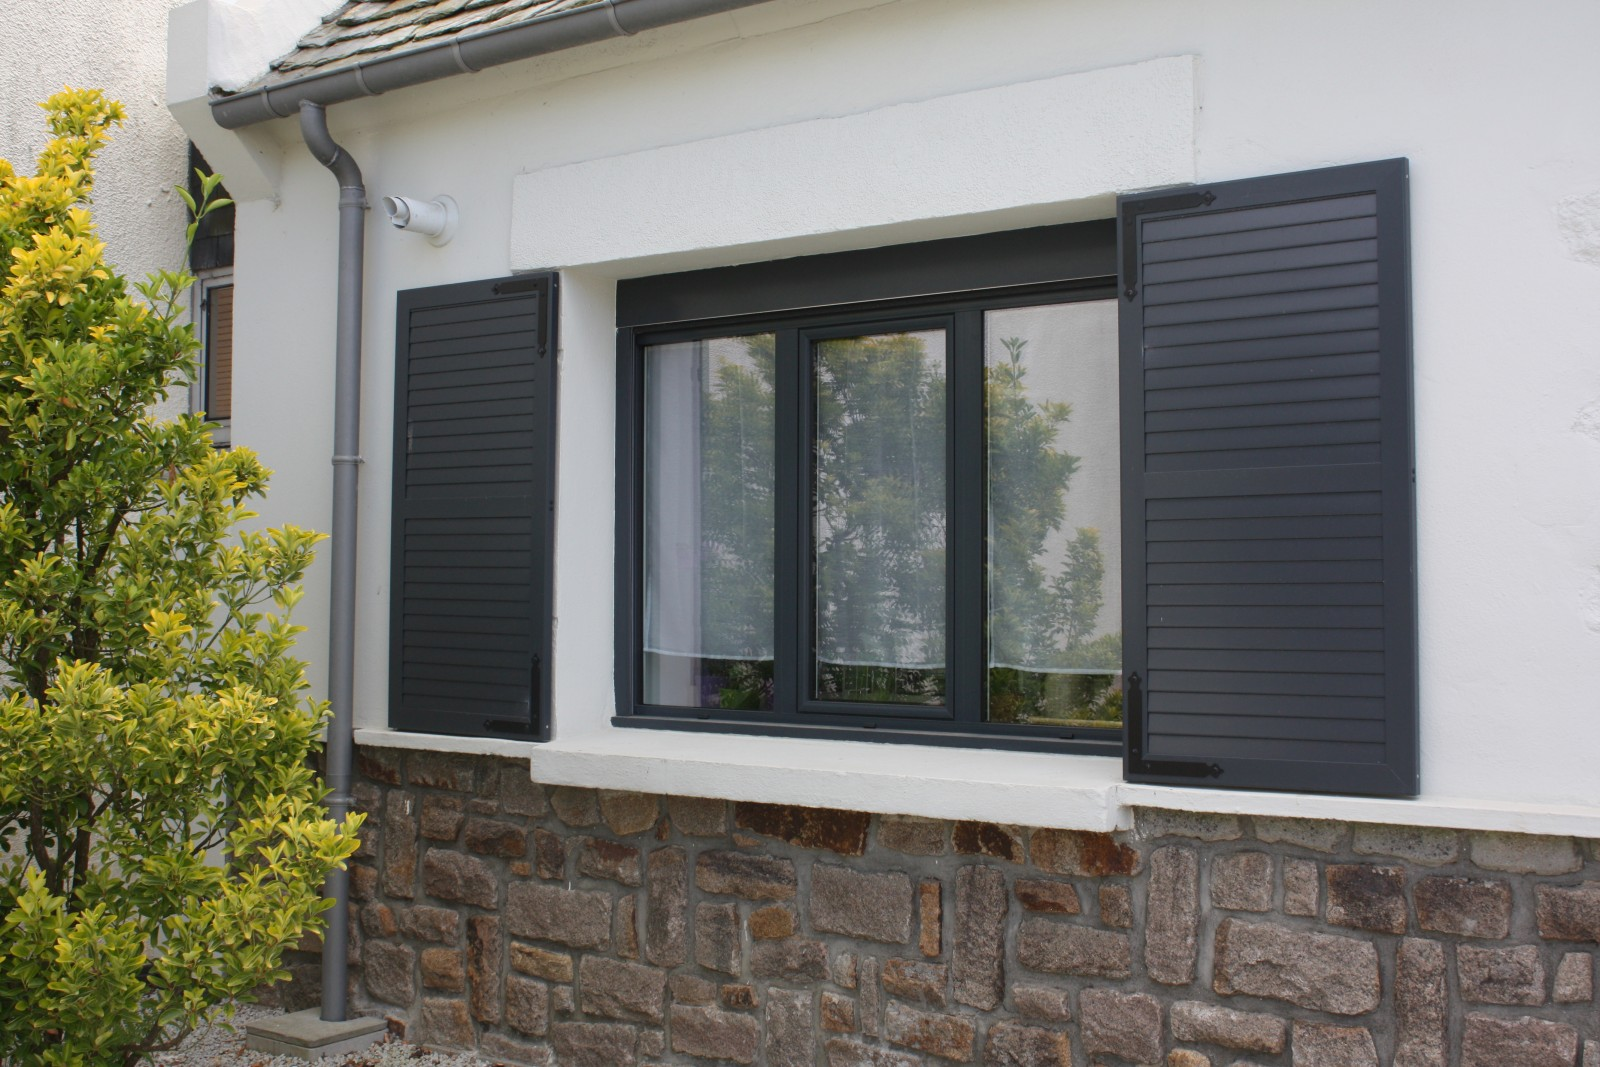 volets pliants alu latest volets pliants en aluminium. Black Bedroom Furniture Sets. Home Design Ideas